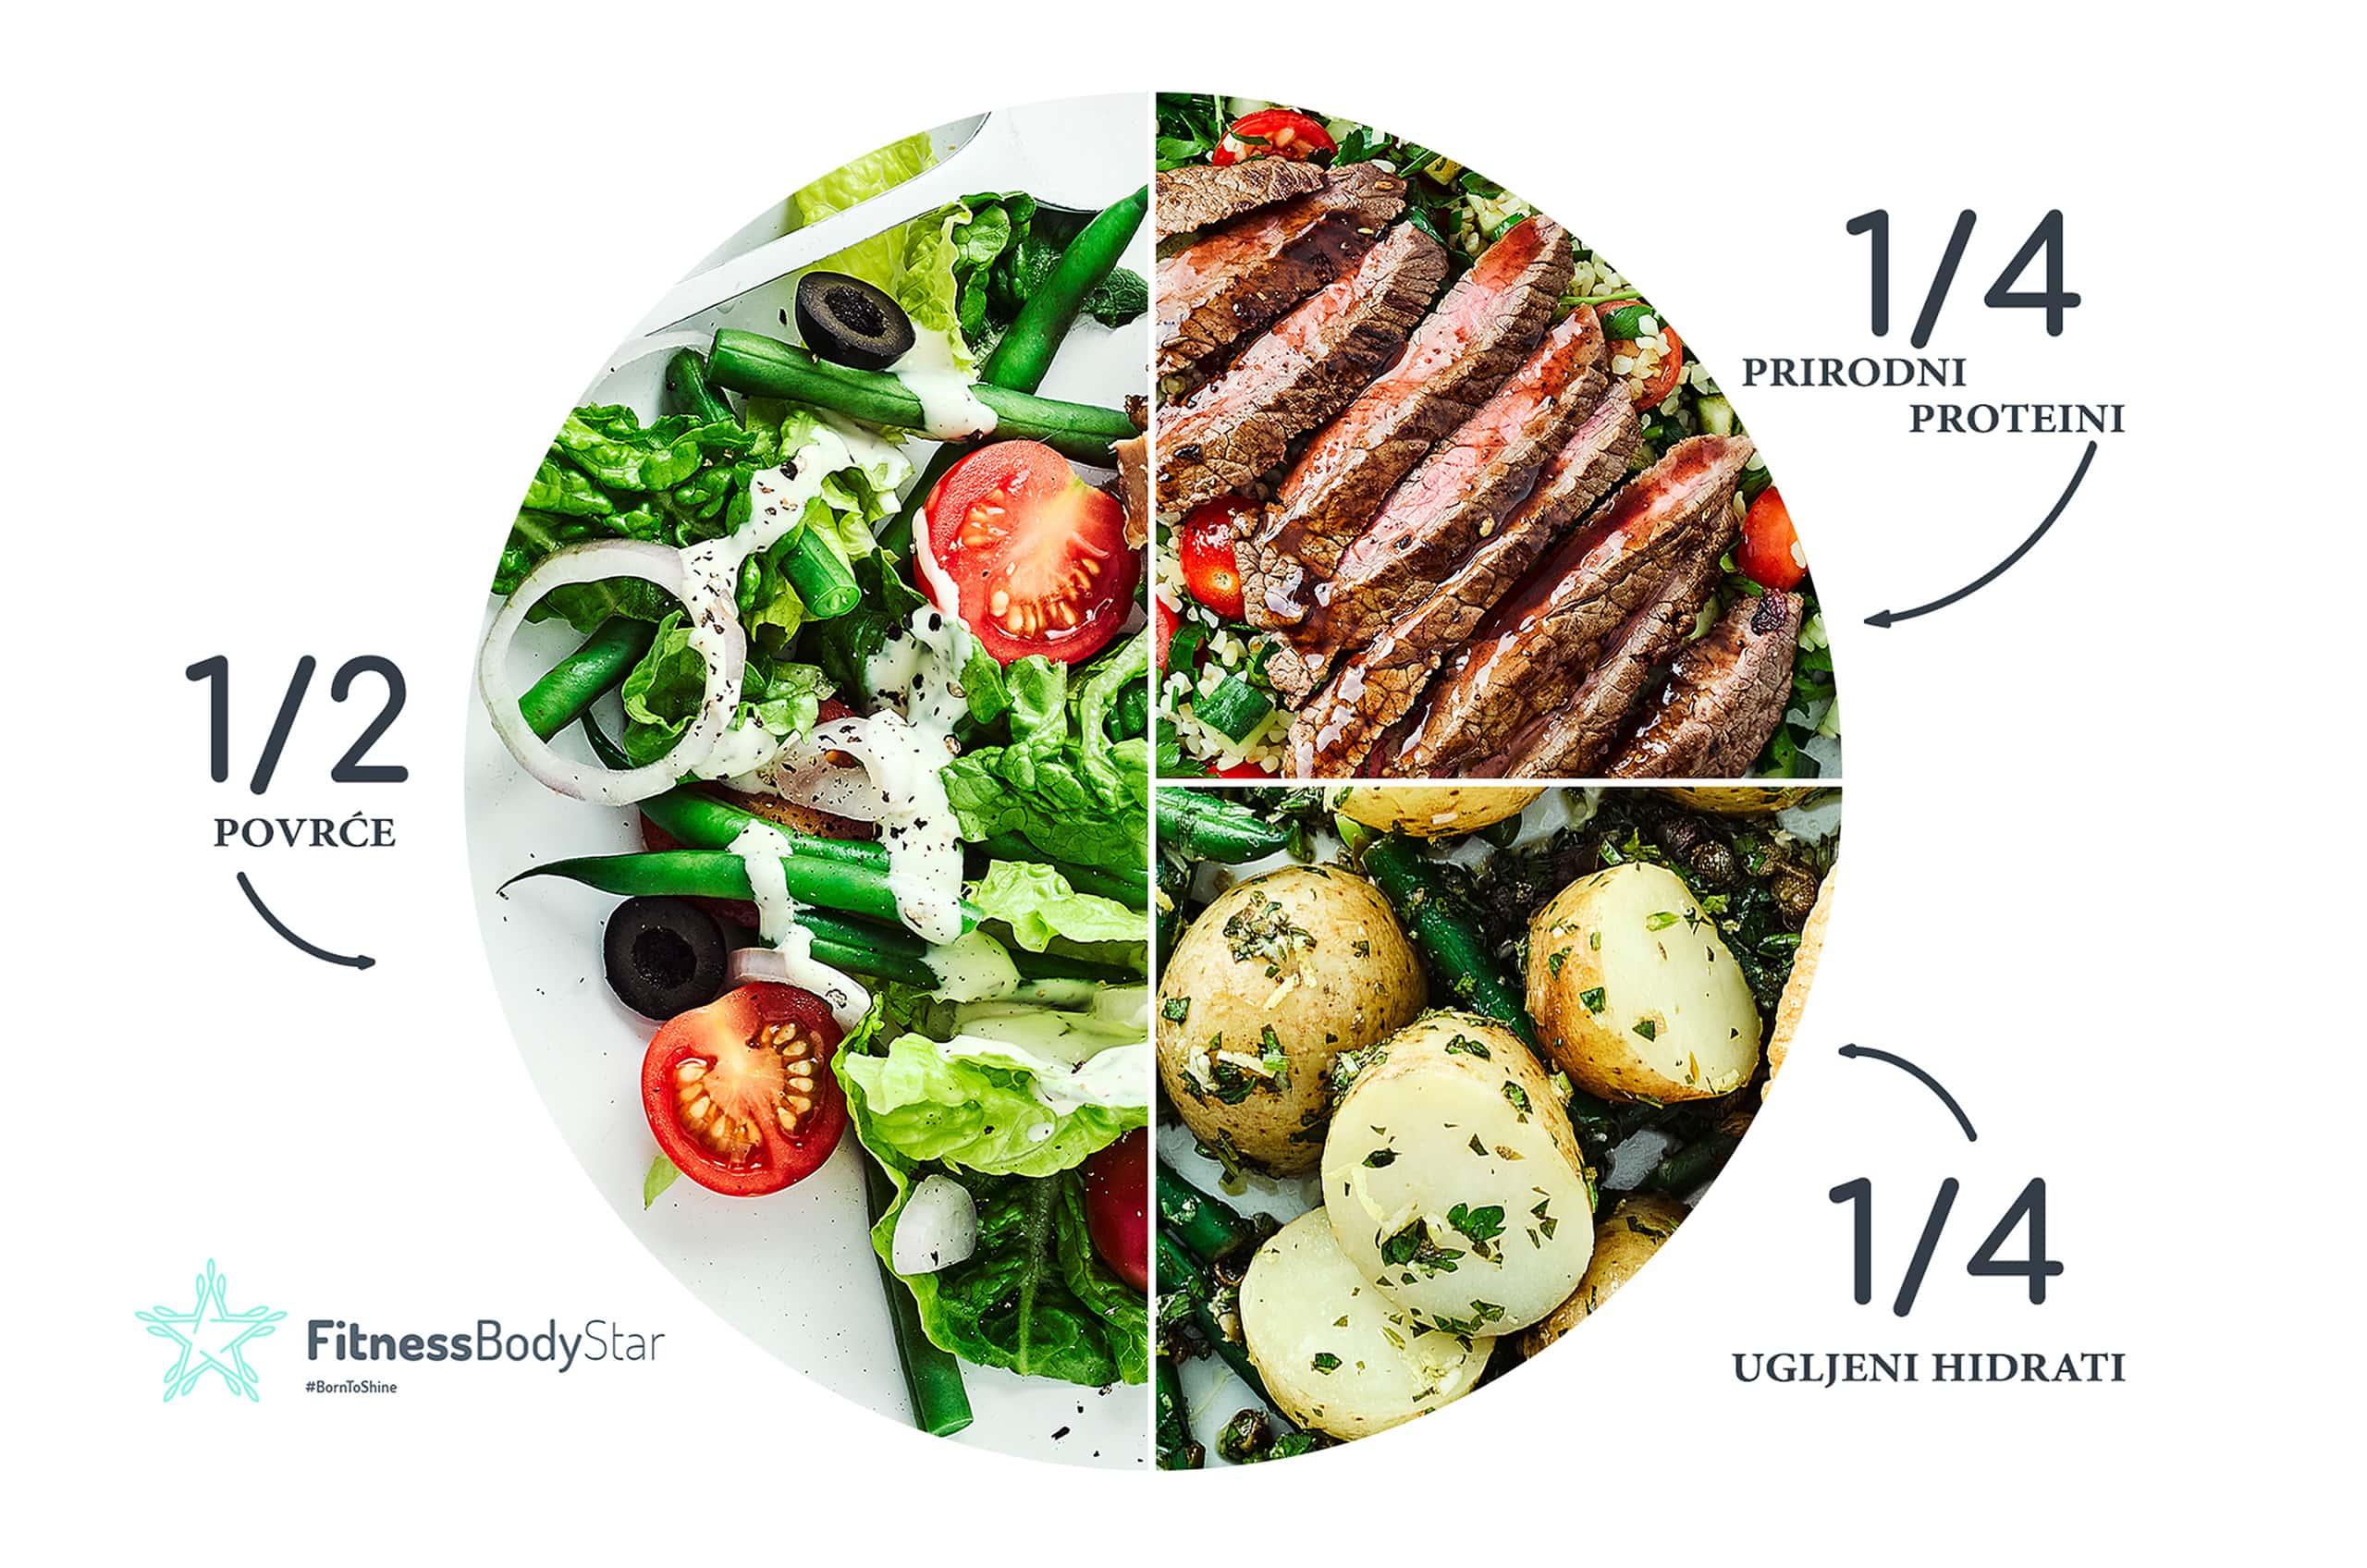 balansirana ishrana grafikon